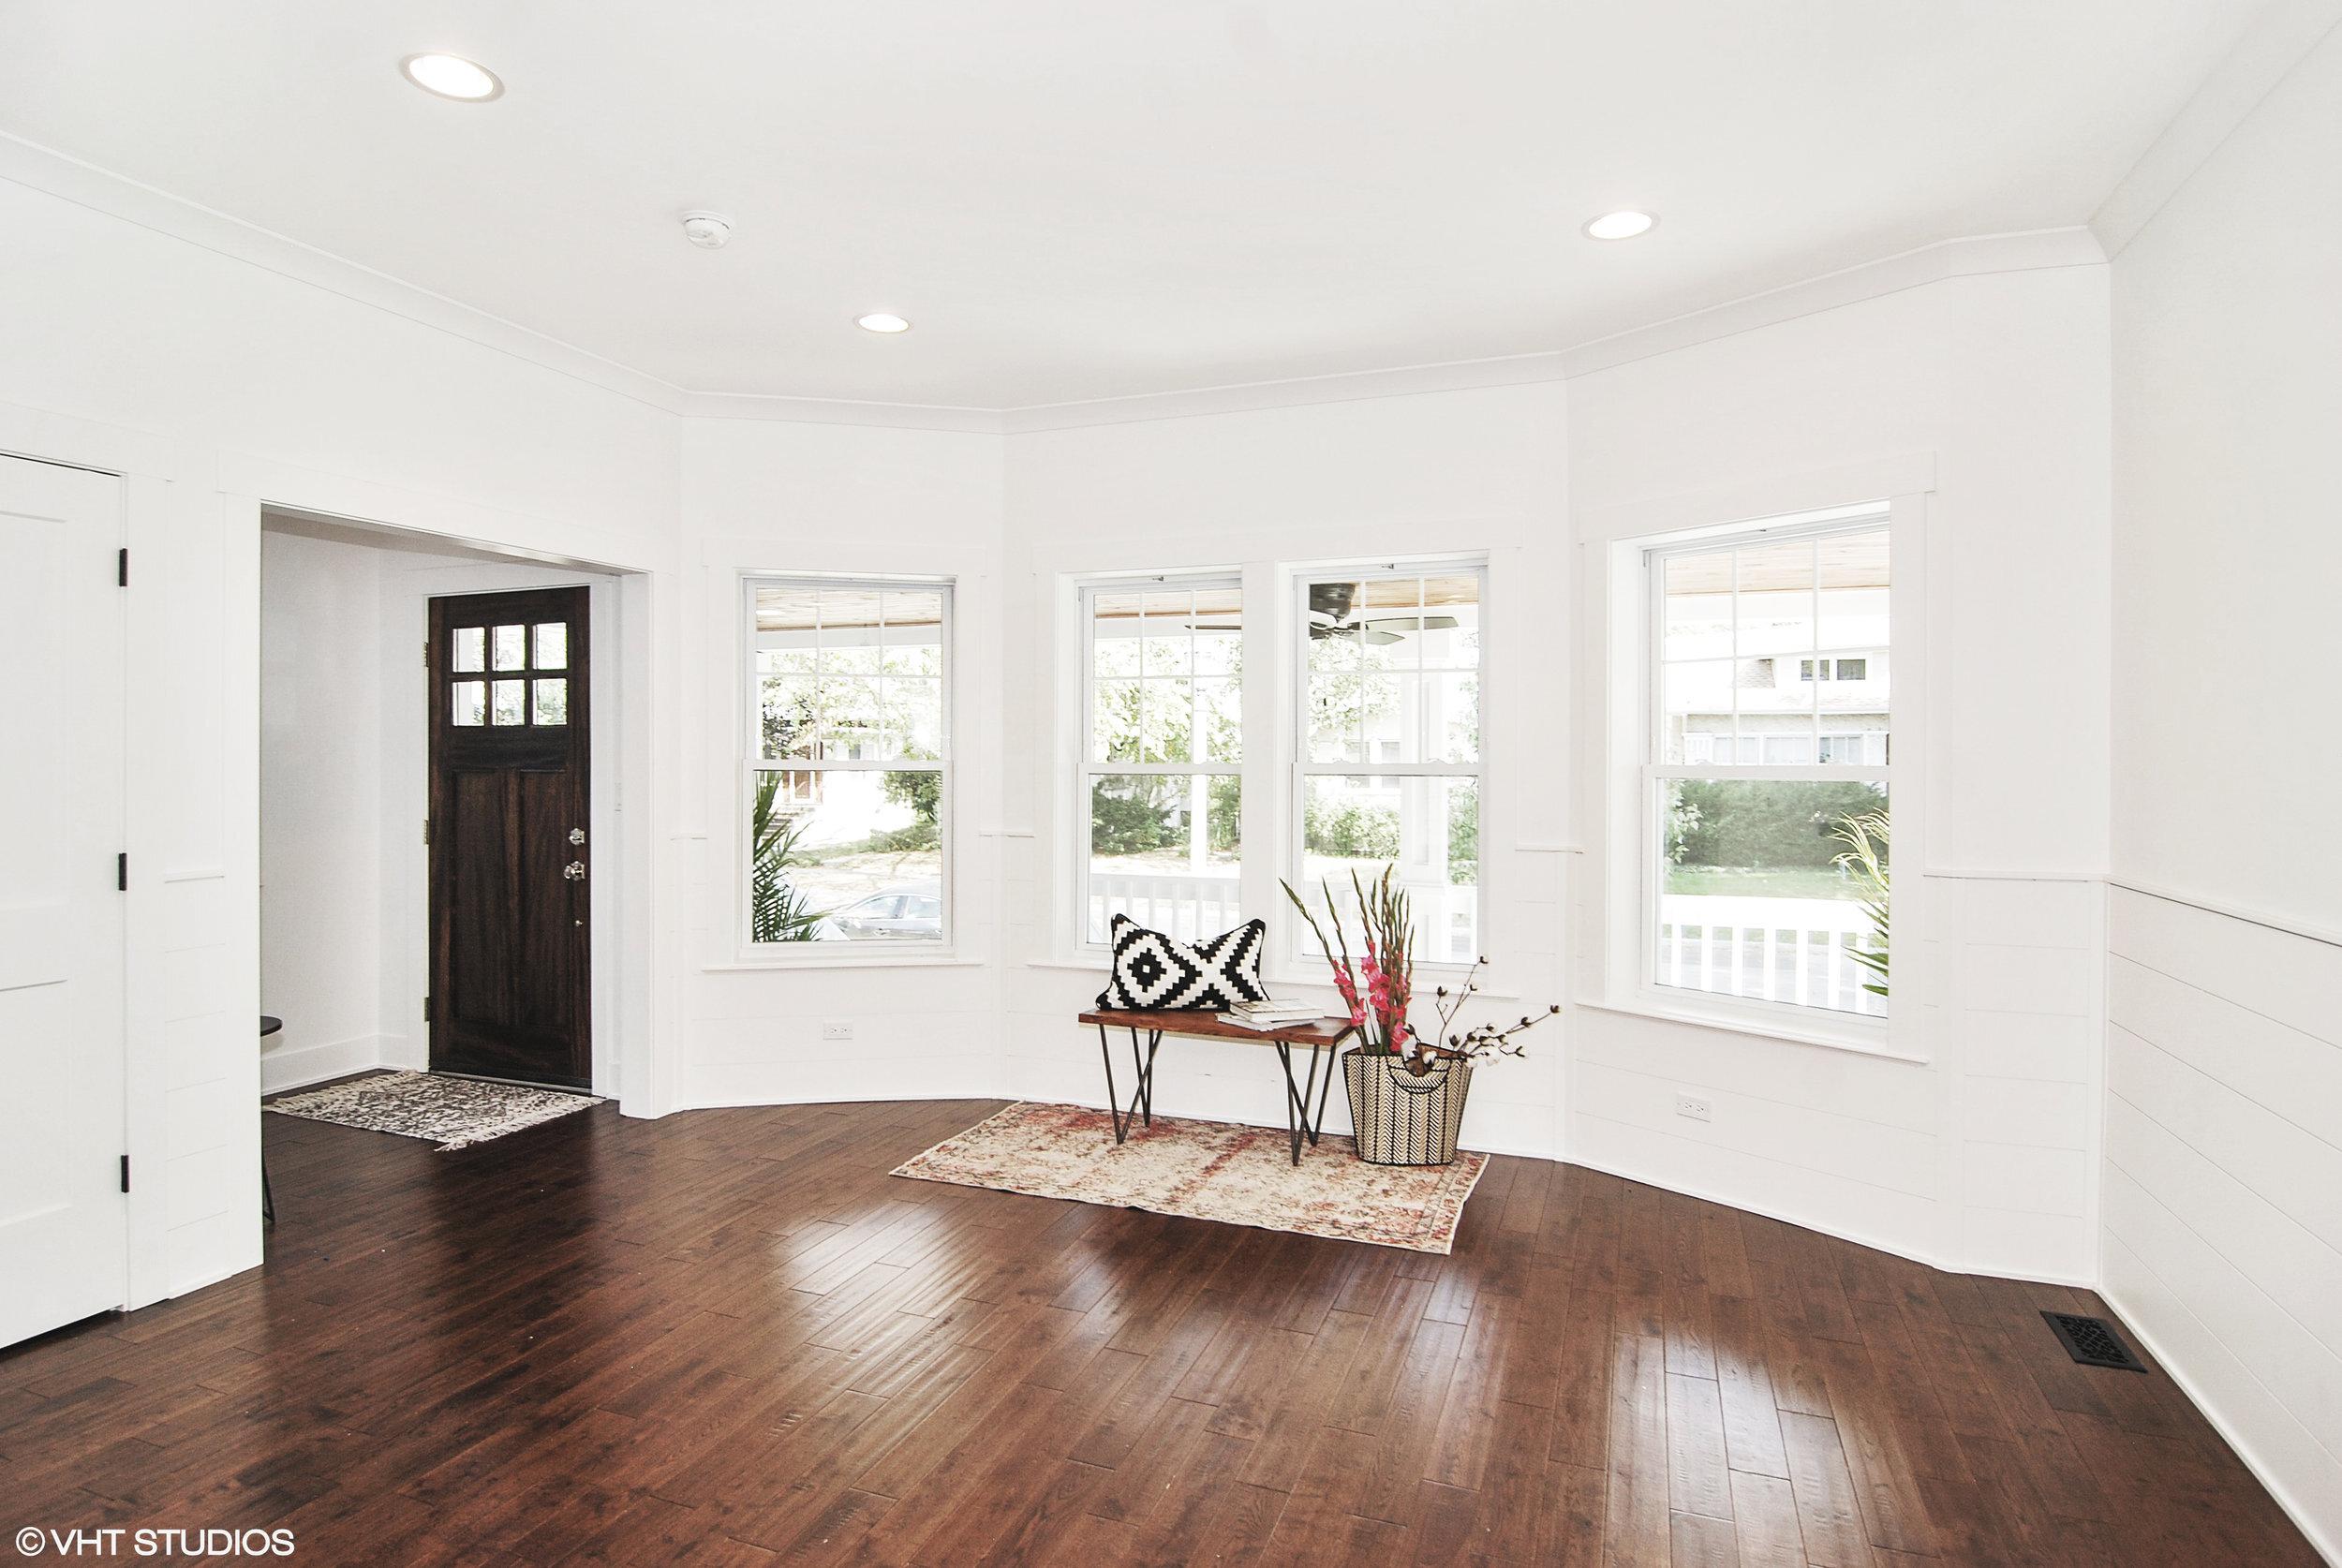 03 837northtaylorave 1 Livingroom Hires